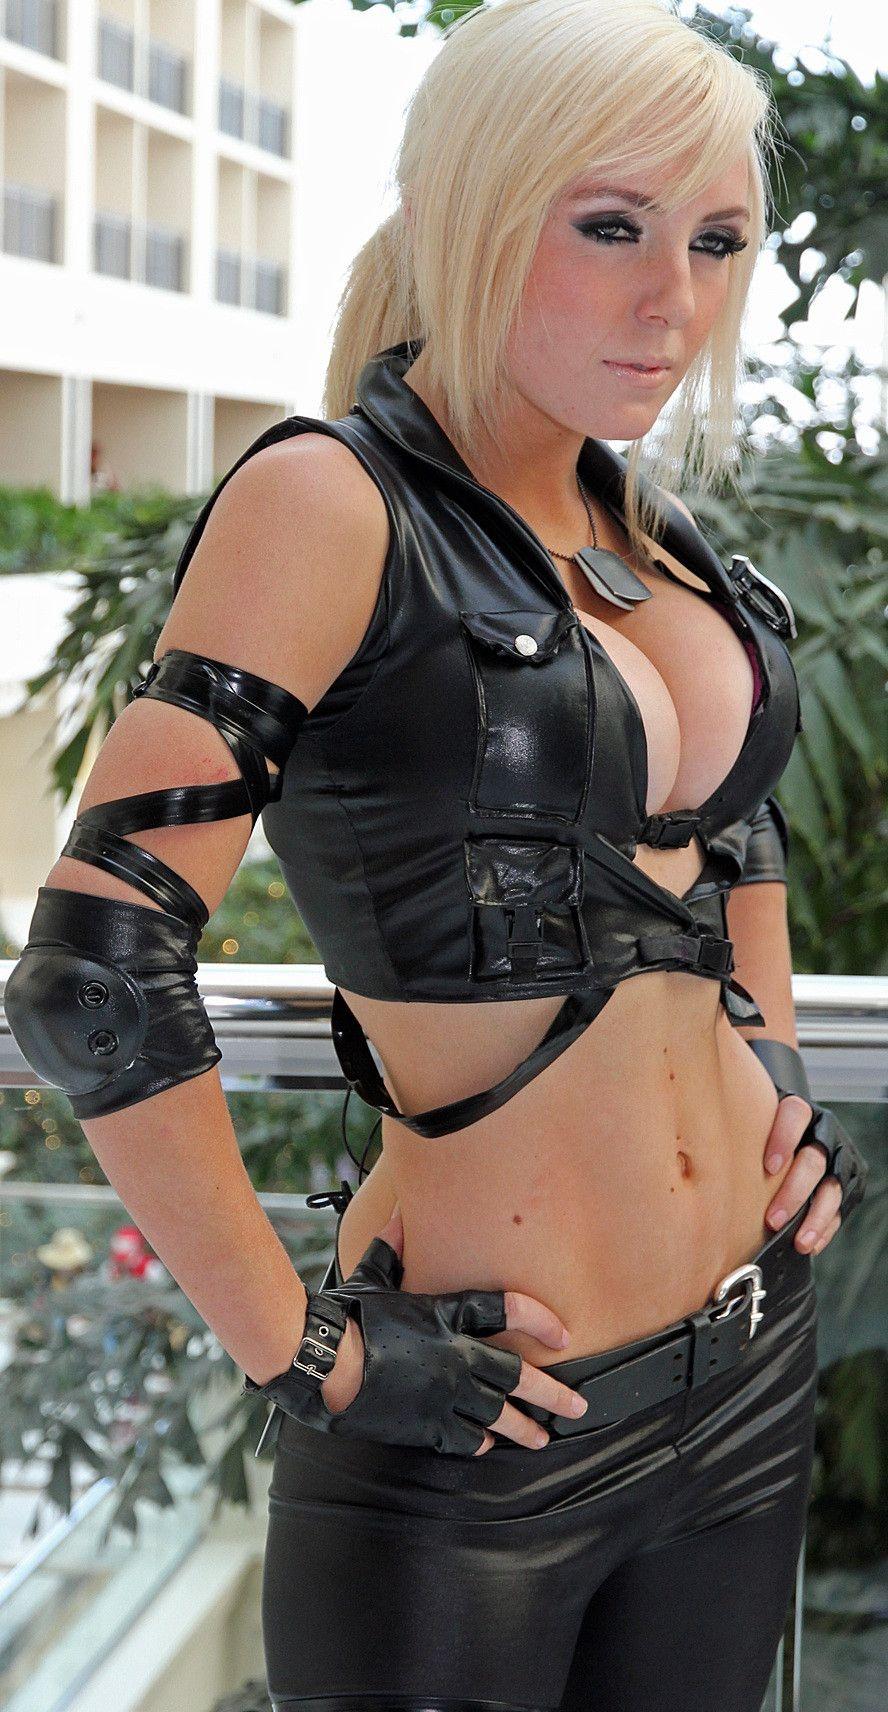 huge prostitute tits